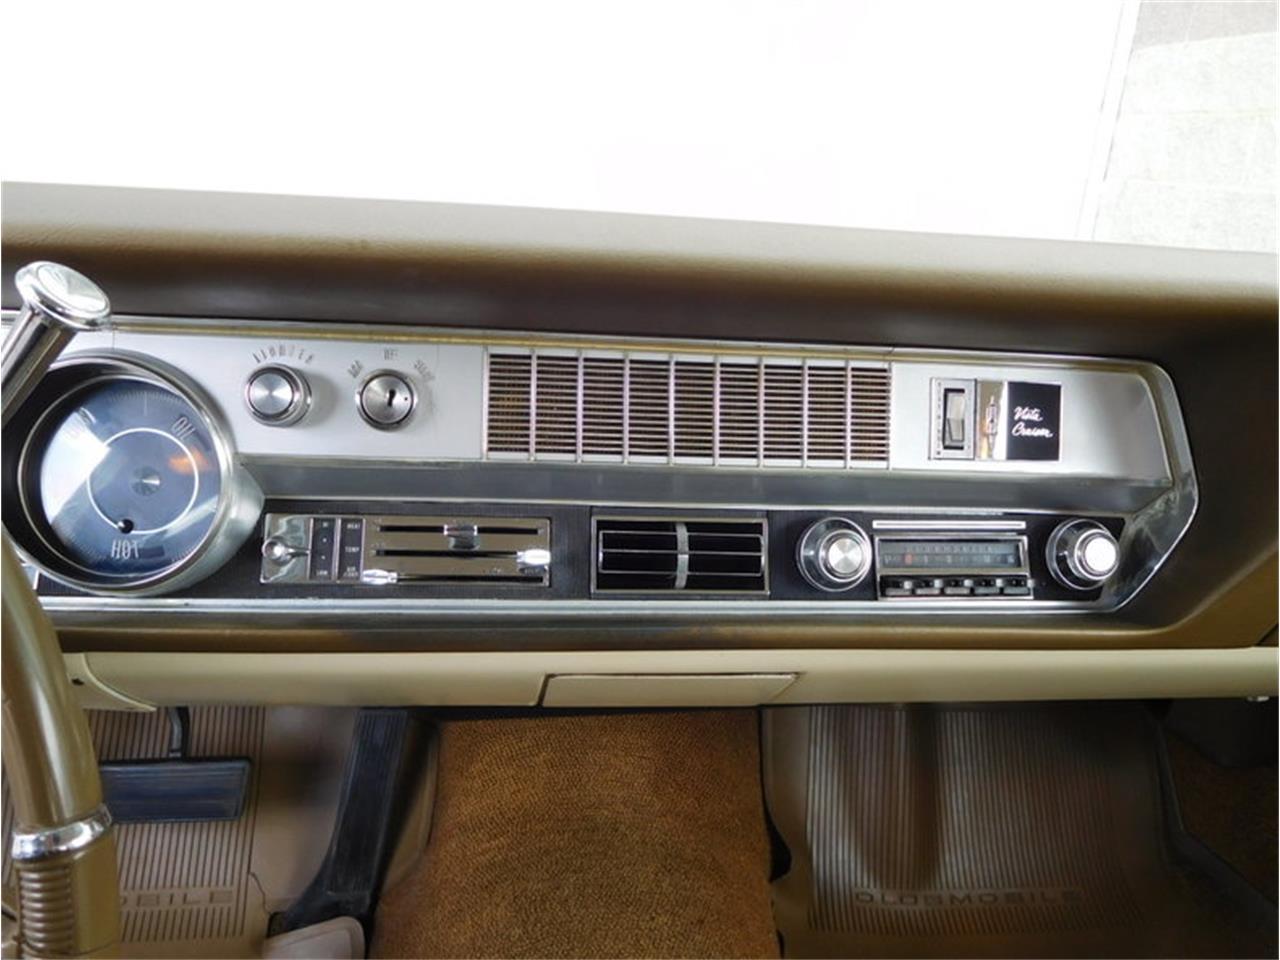 Large Picture of Classic '67 Vista Cruiser located in Alsip Illinois - $19,900.00 - MABL